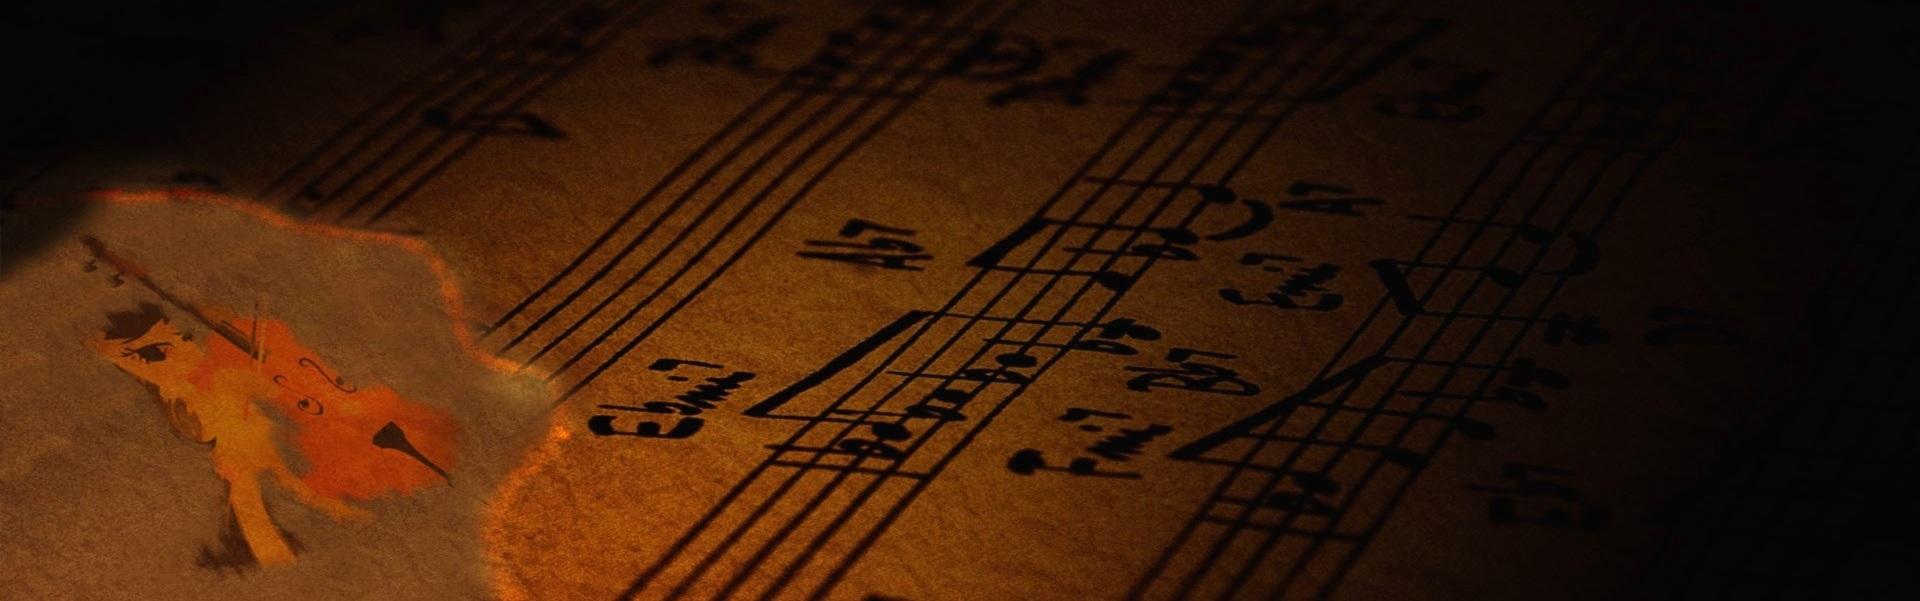 1920x600-music-paper